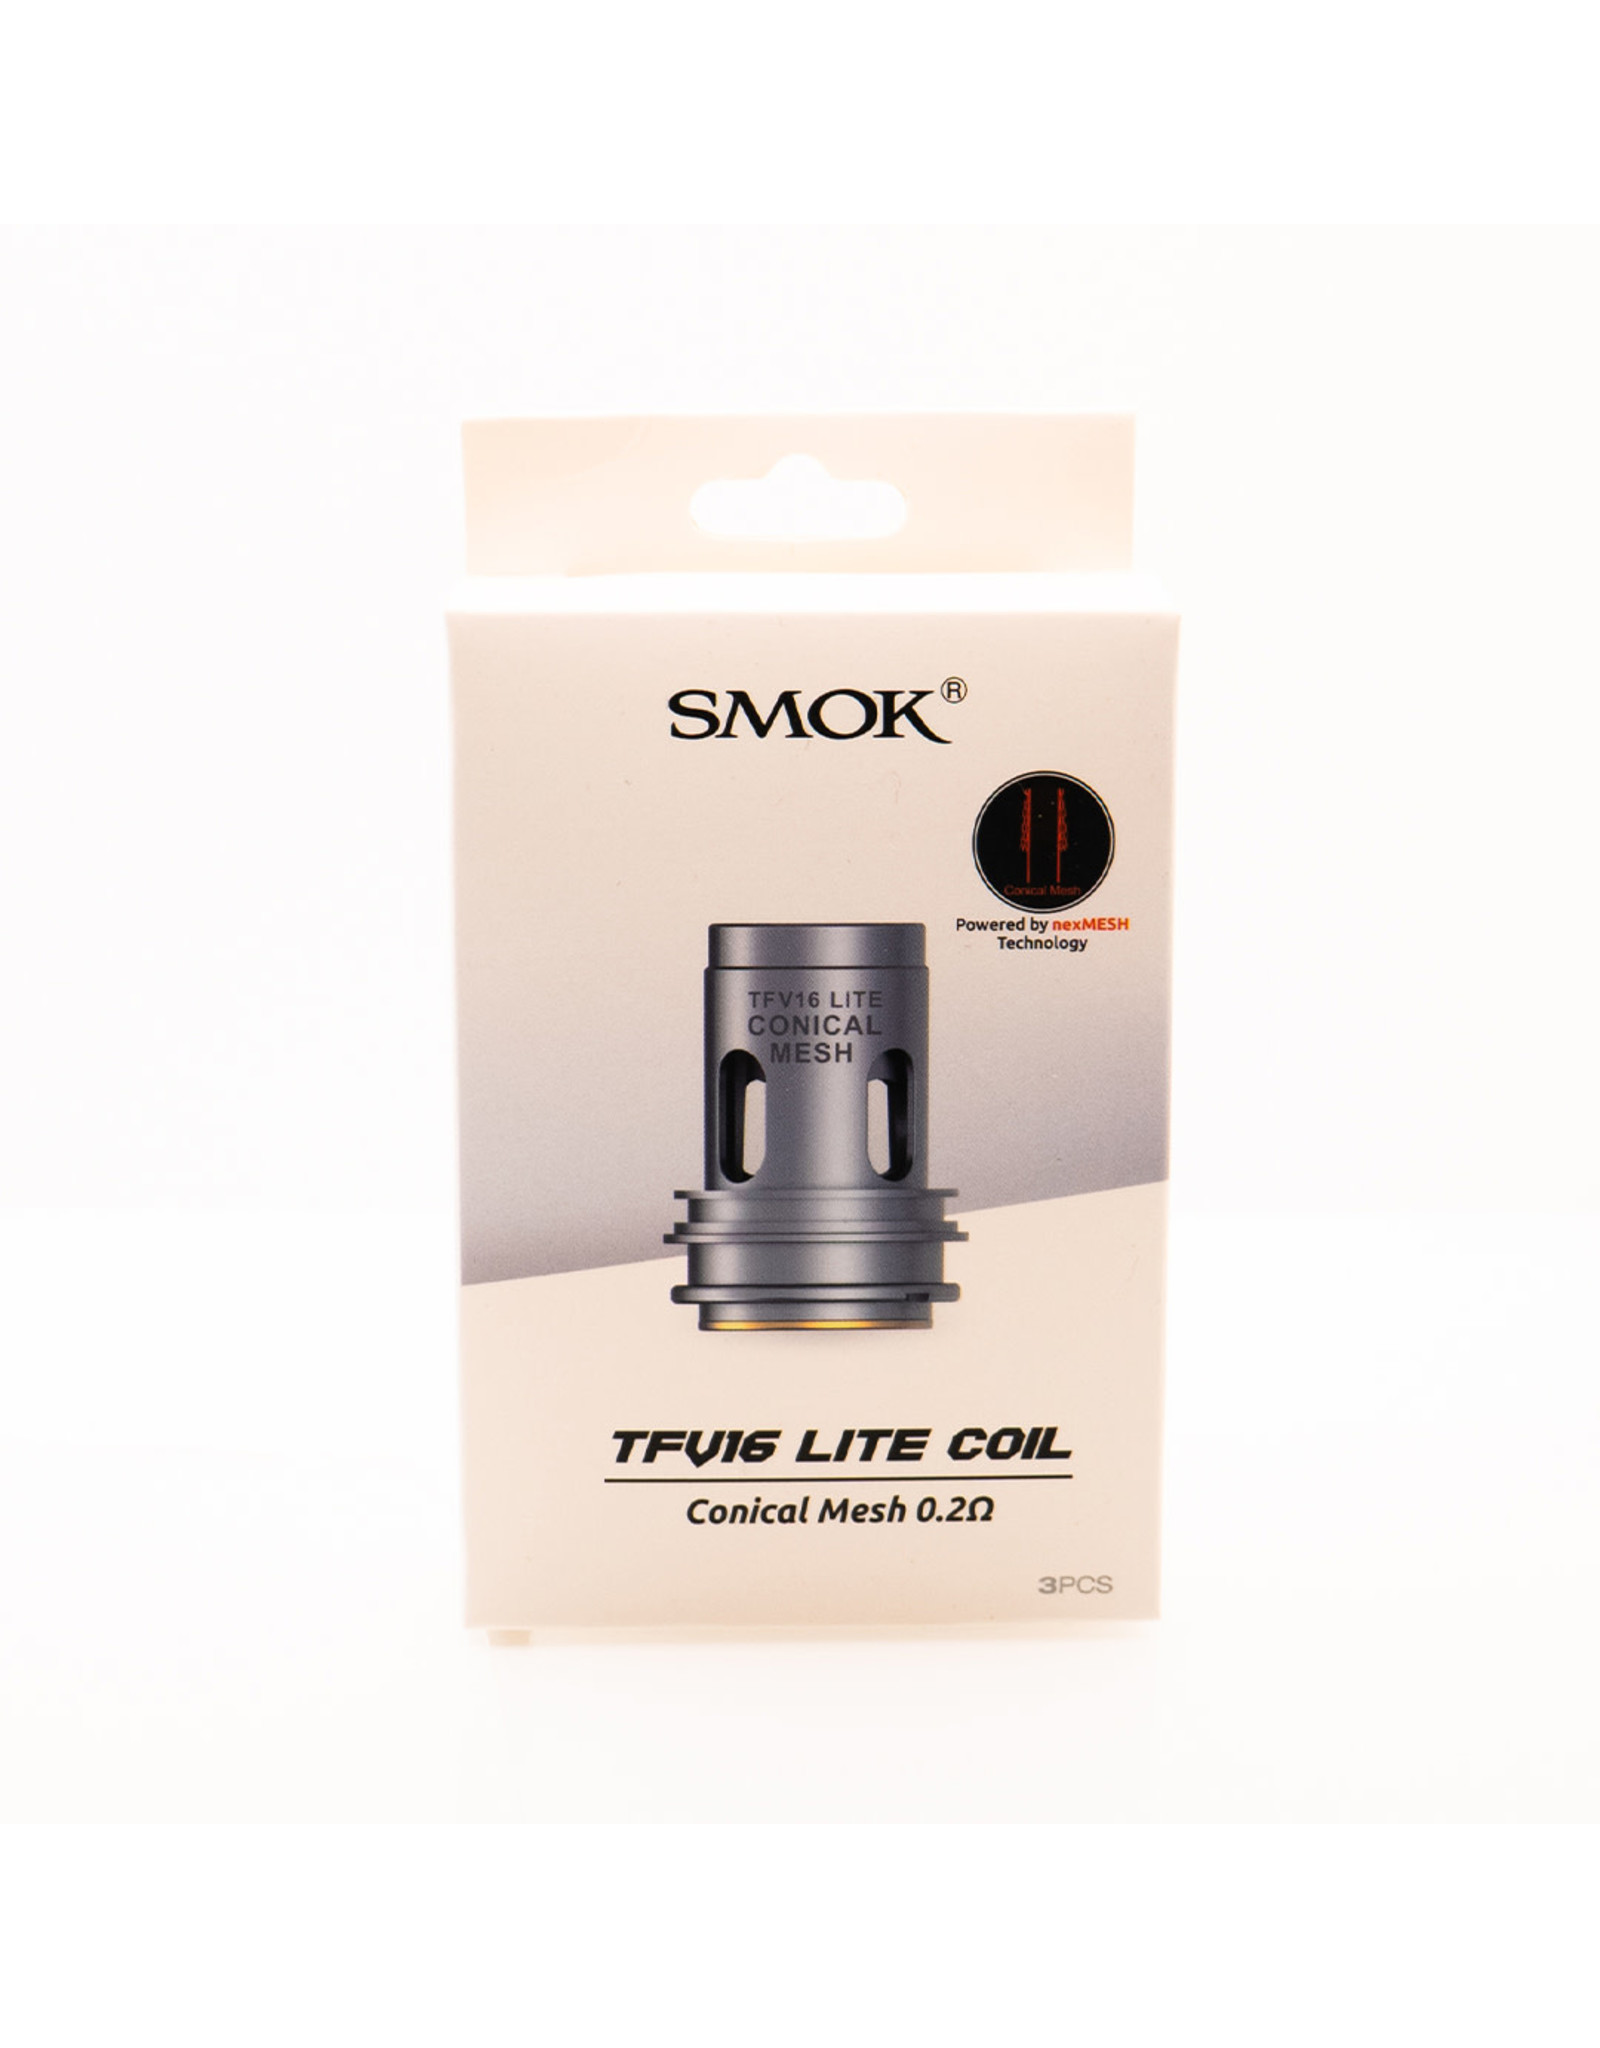 SMOK SMOK: TFV16 Lite Coils-